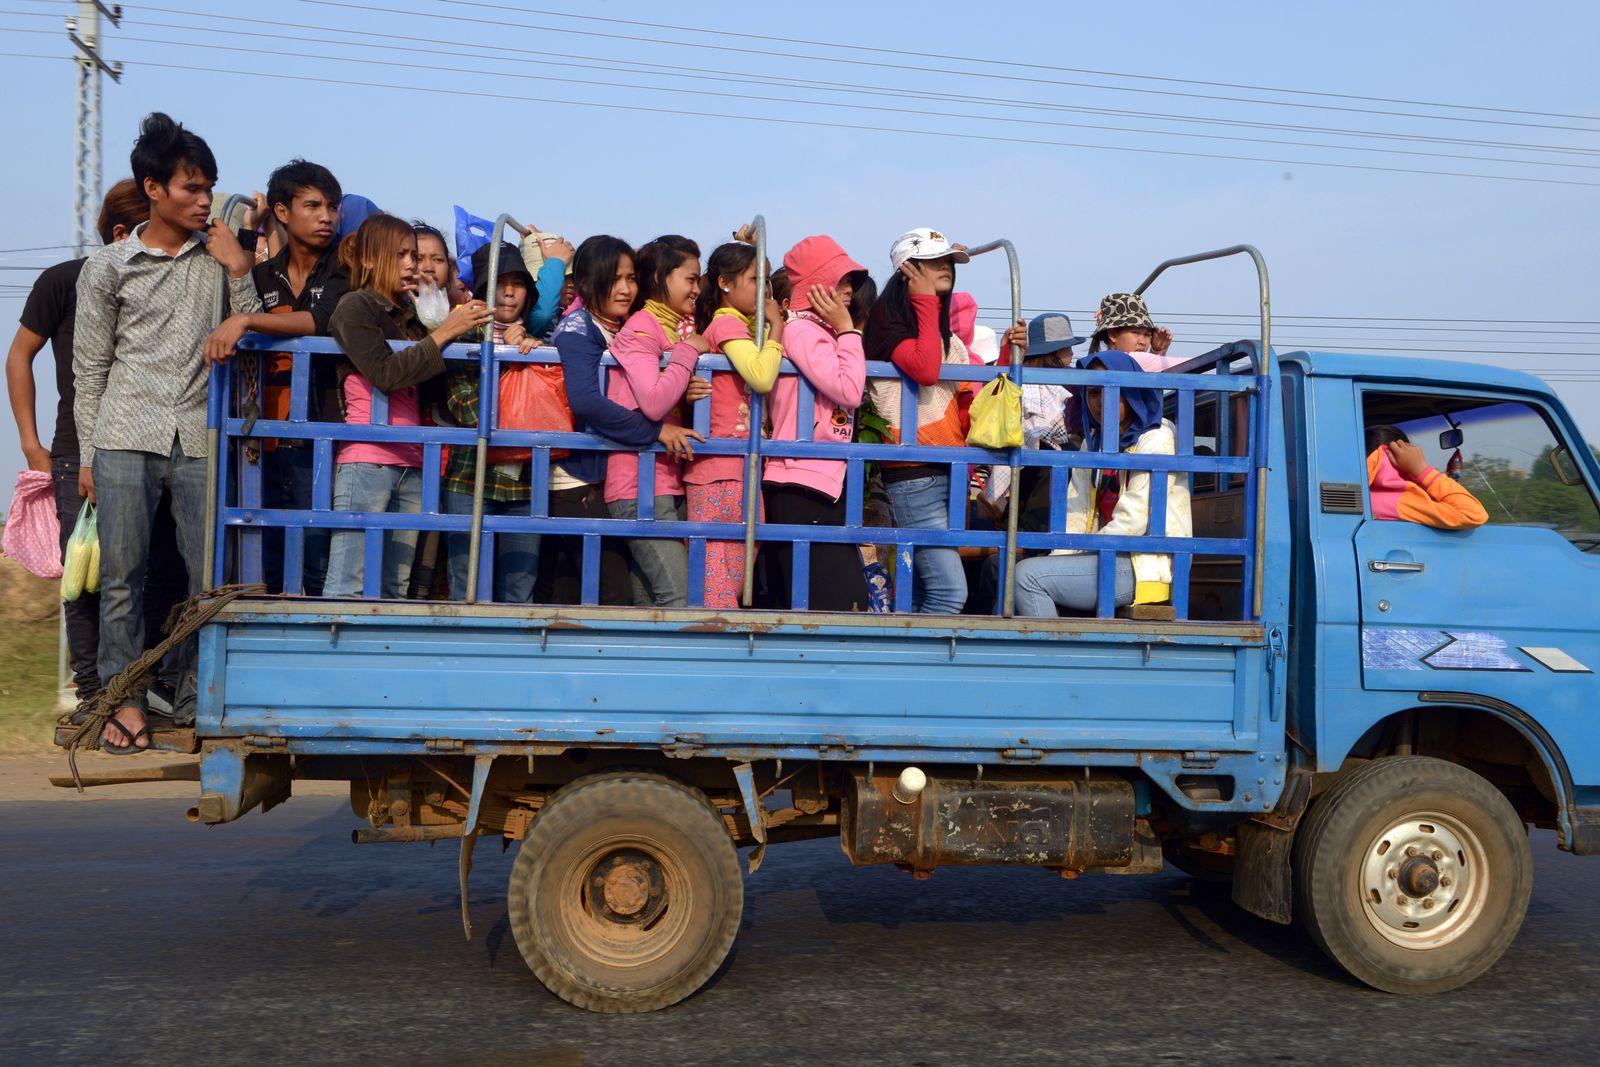 Kambodscha/ Arbeitsbedingungen/ Bericht